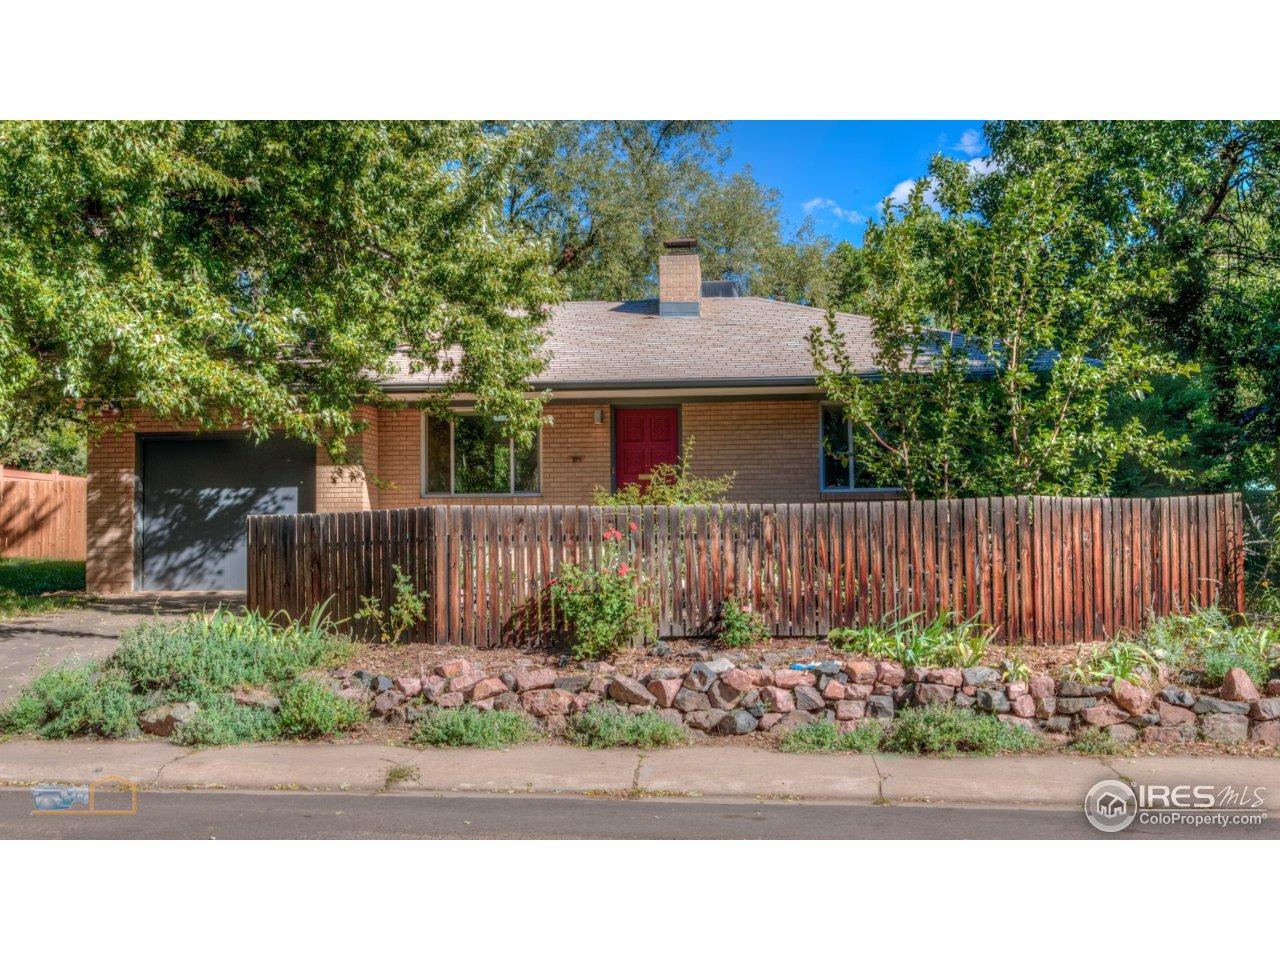 835 Iris Ave, Boulder CO 80304